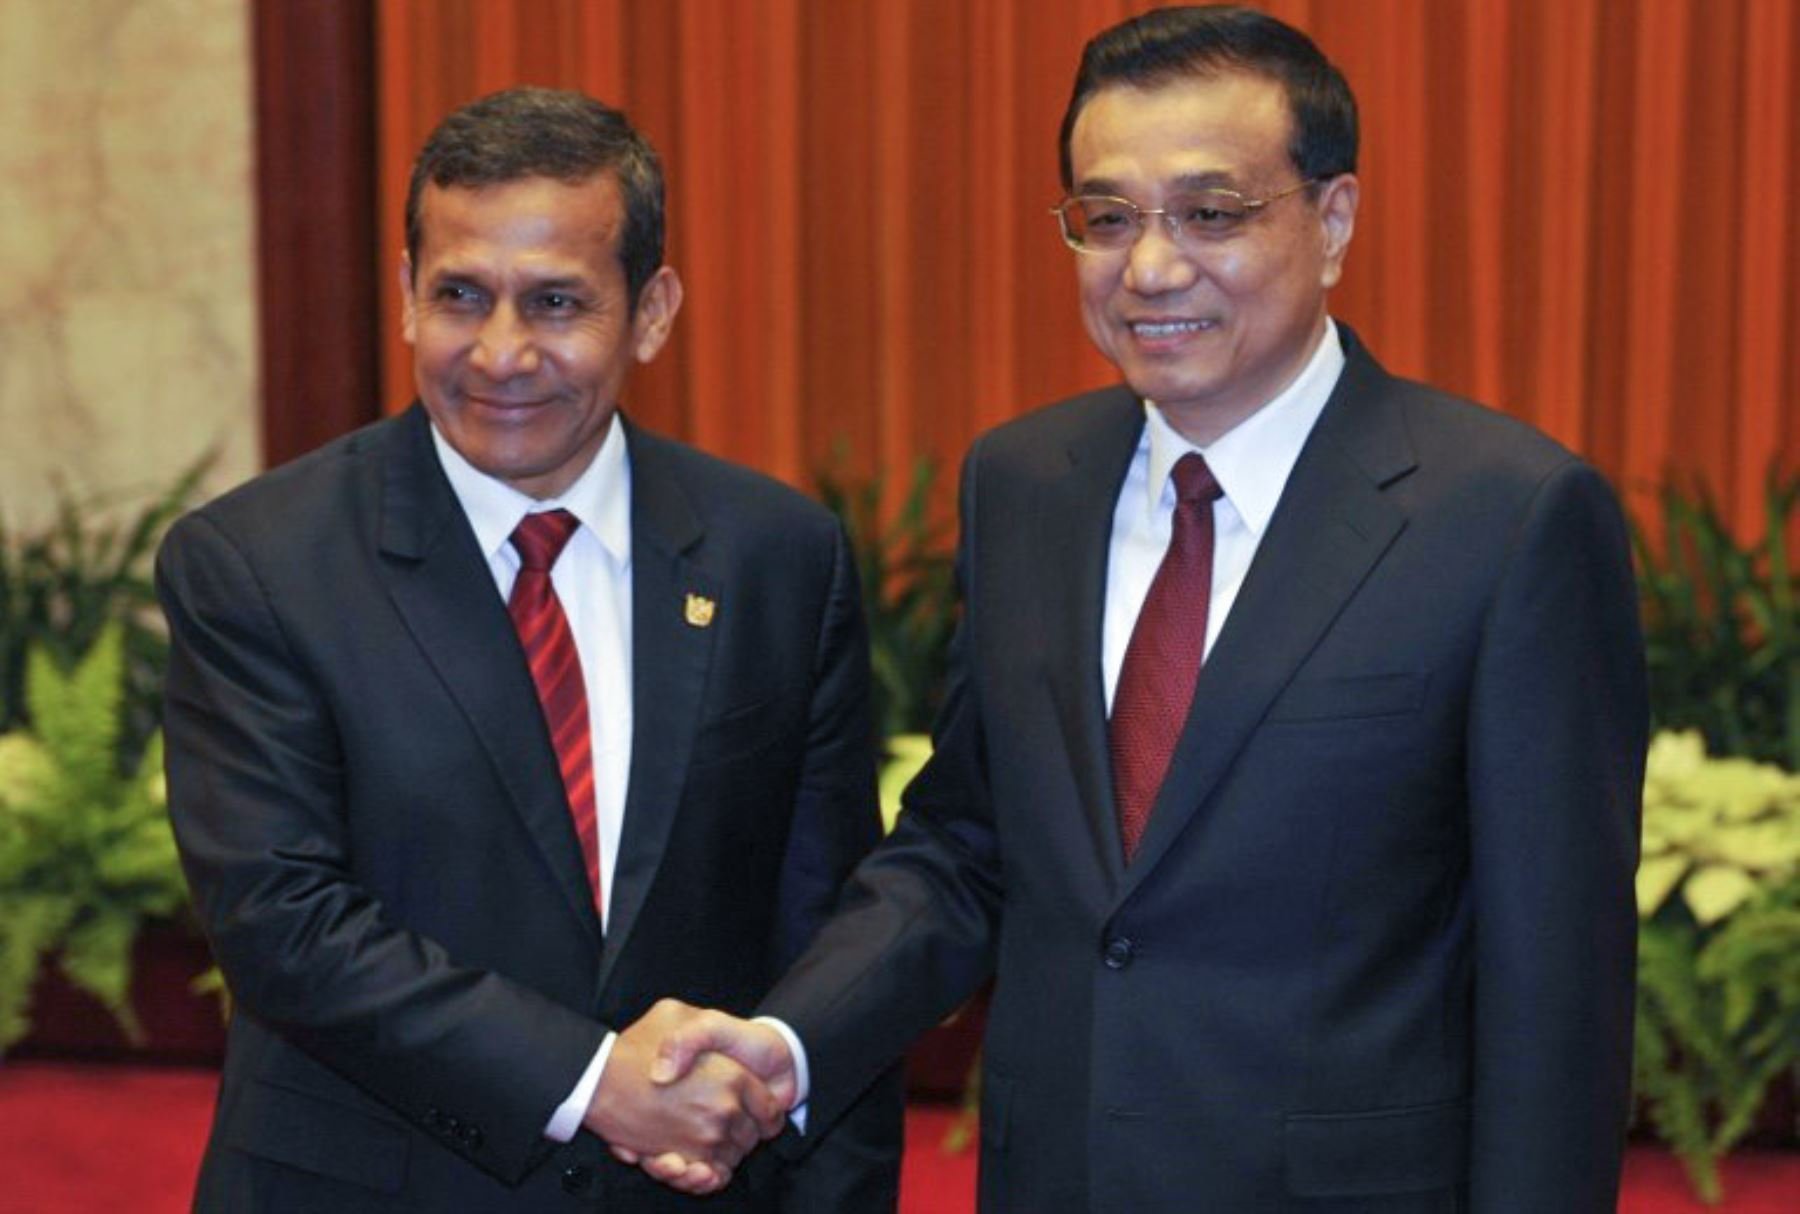 Jefe del Estado, Ollanta Humala, se reunirá en Lima con primer ministro de China, Li Keqiang. Foto: AFP